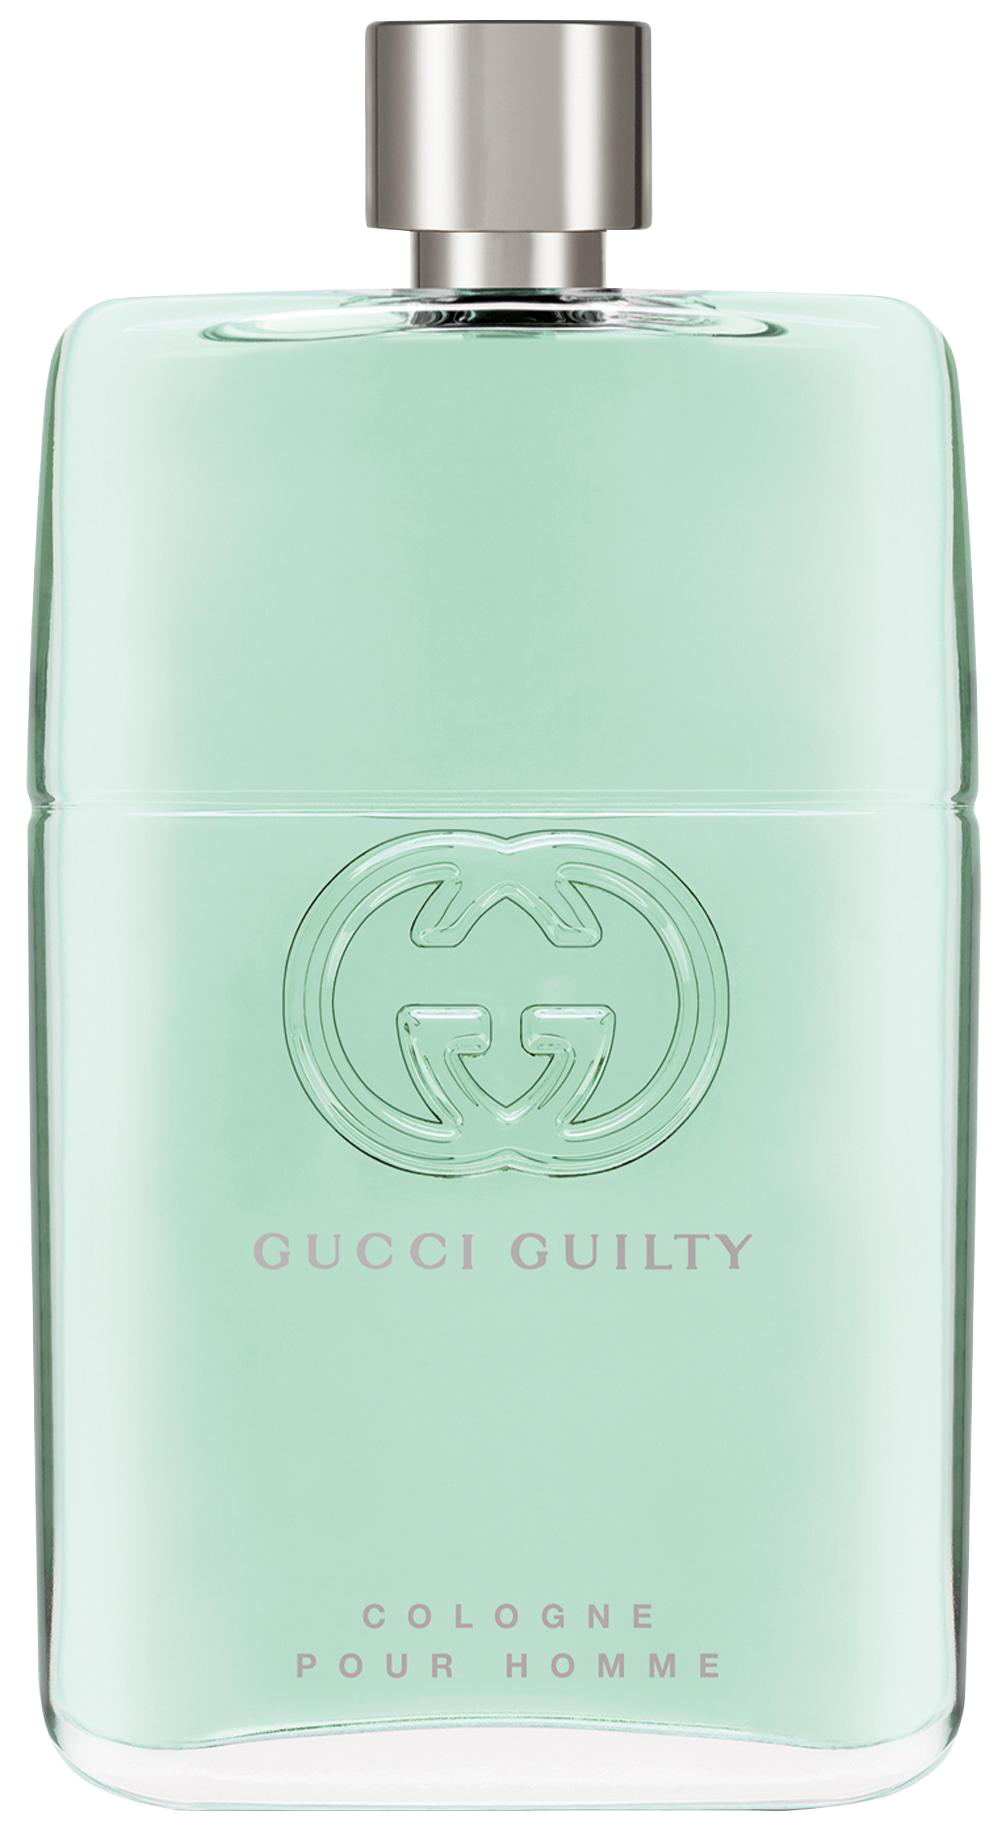 Мужская парфюмерия GUCCI GUILTY COLOGNE 90 мл